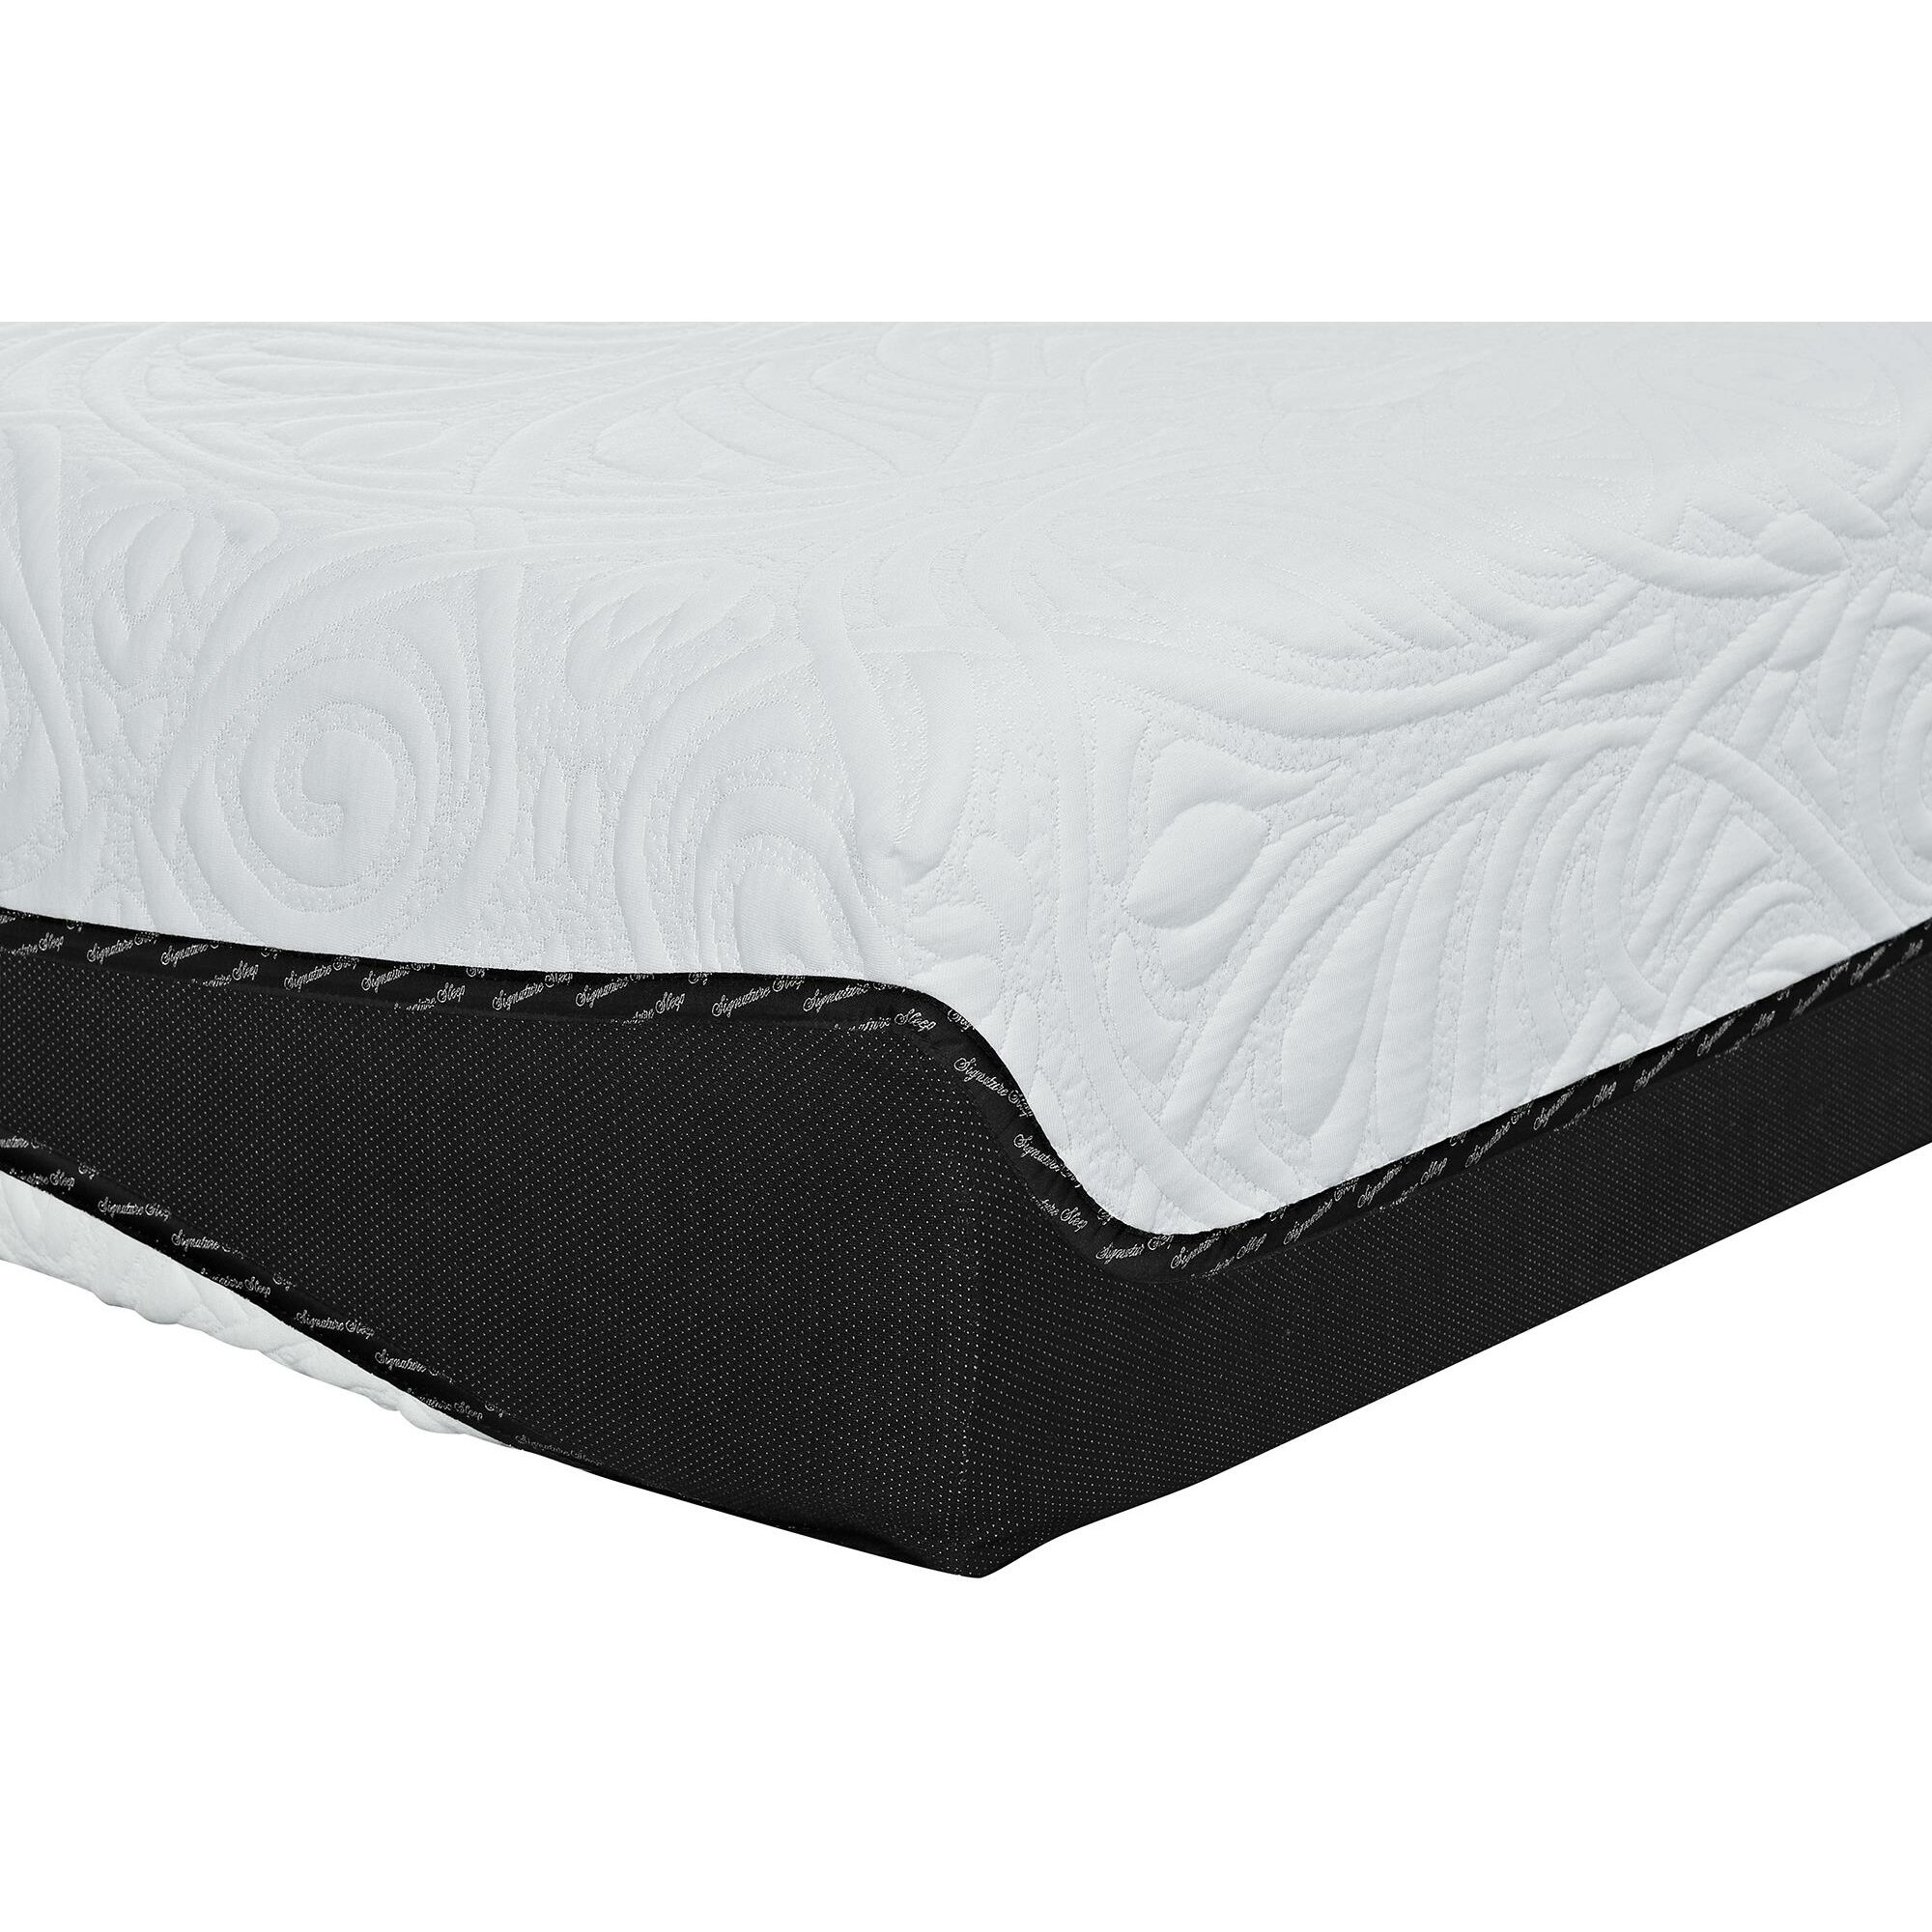 Dhp signature sleep 12 gel memory foam mattress reviews for Living spaces mattress reviews